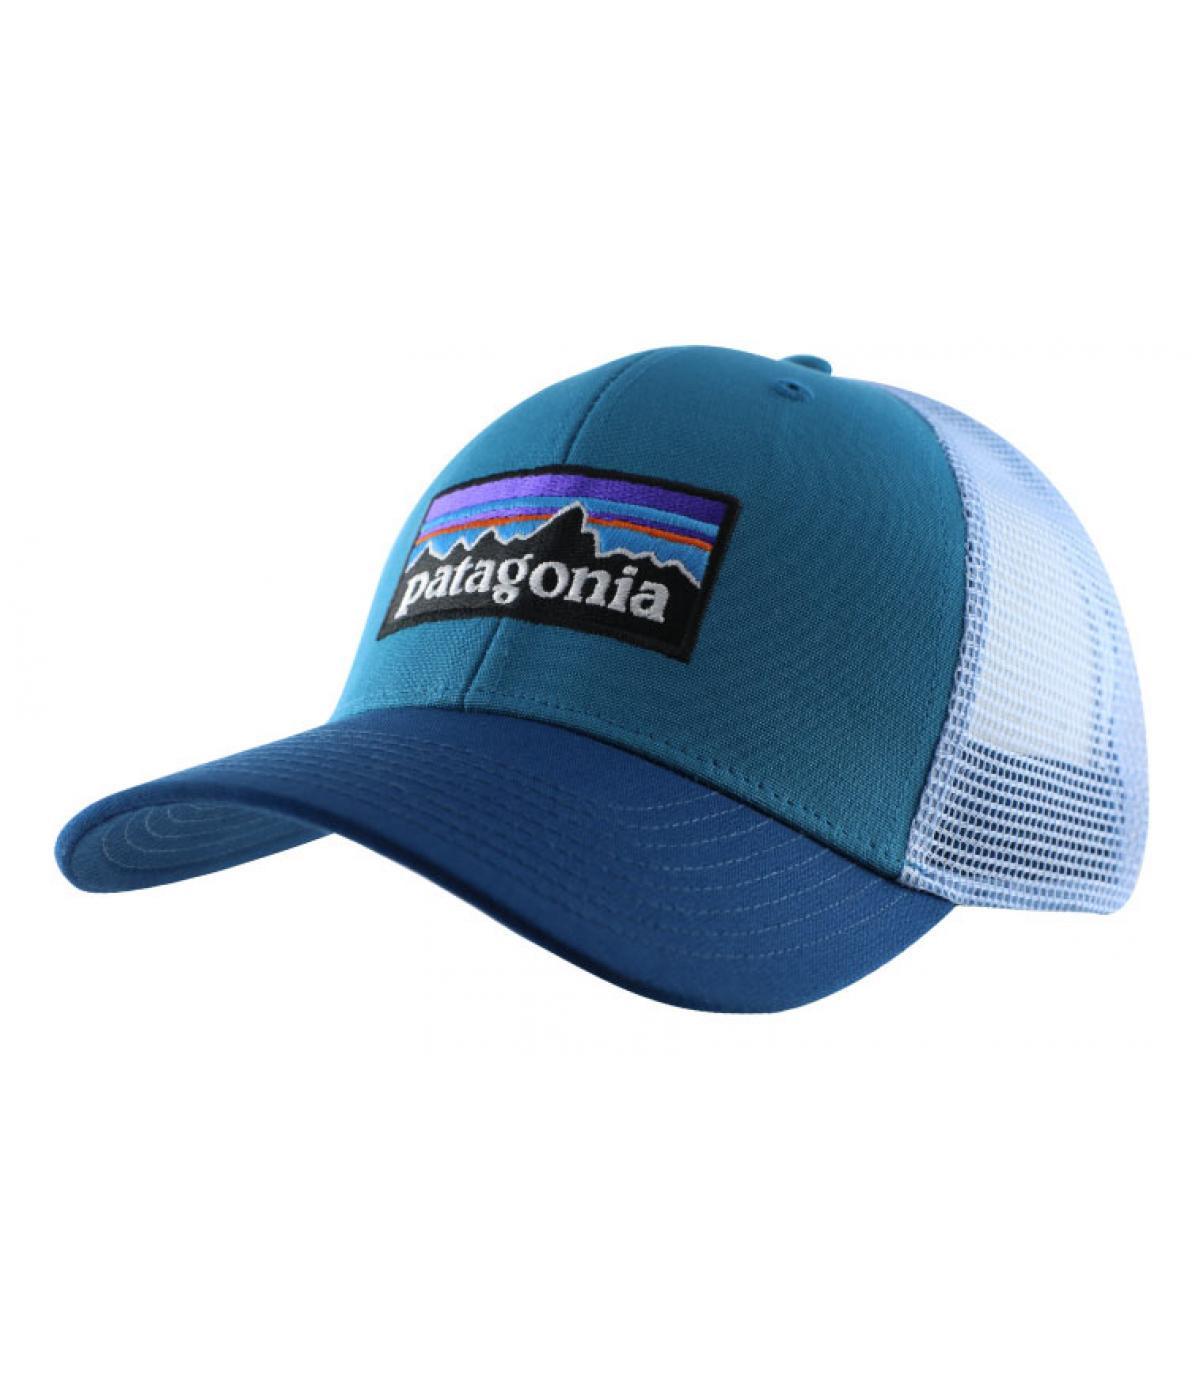 Patagonia blu trucker